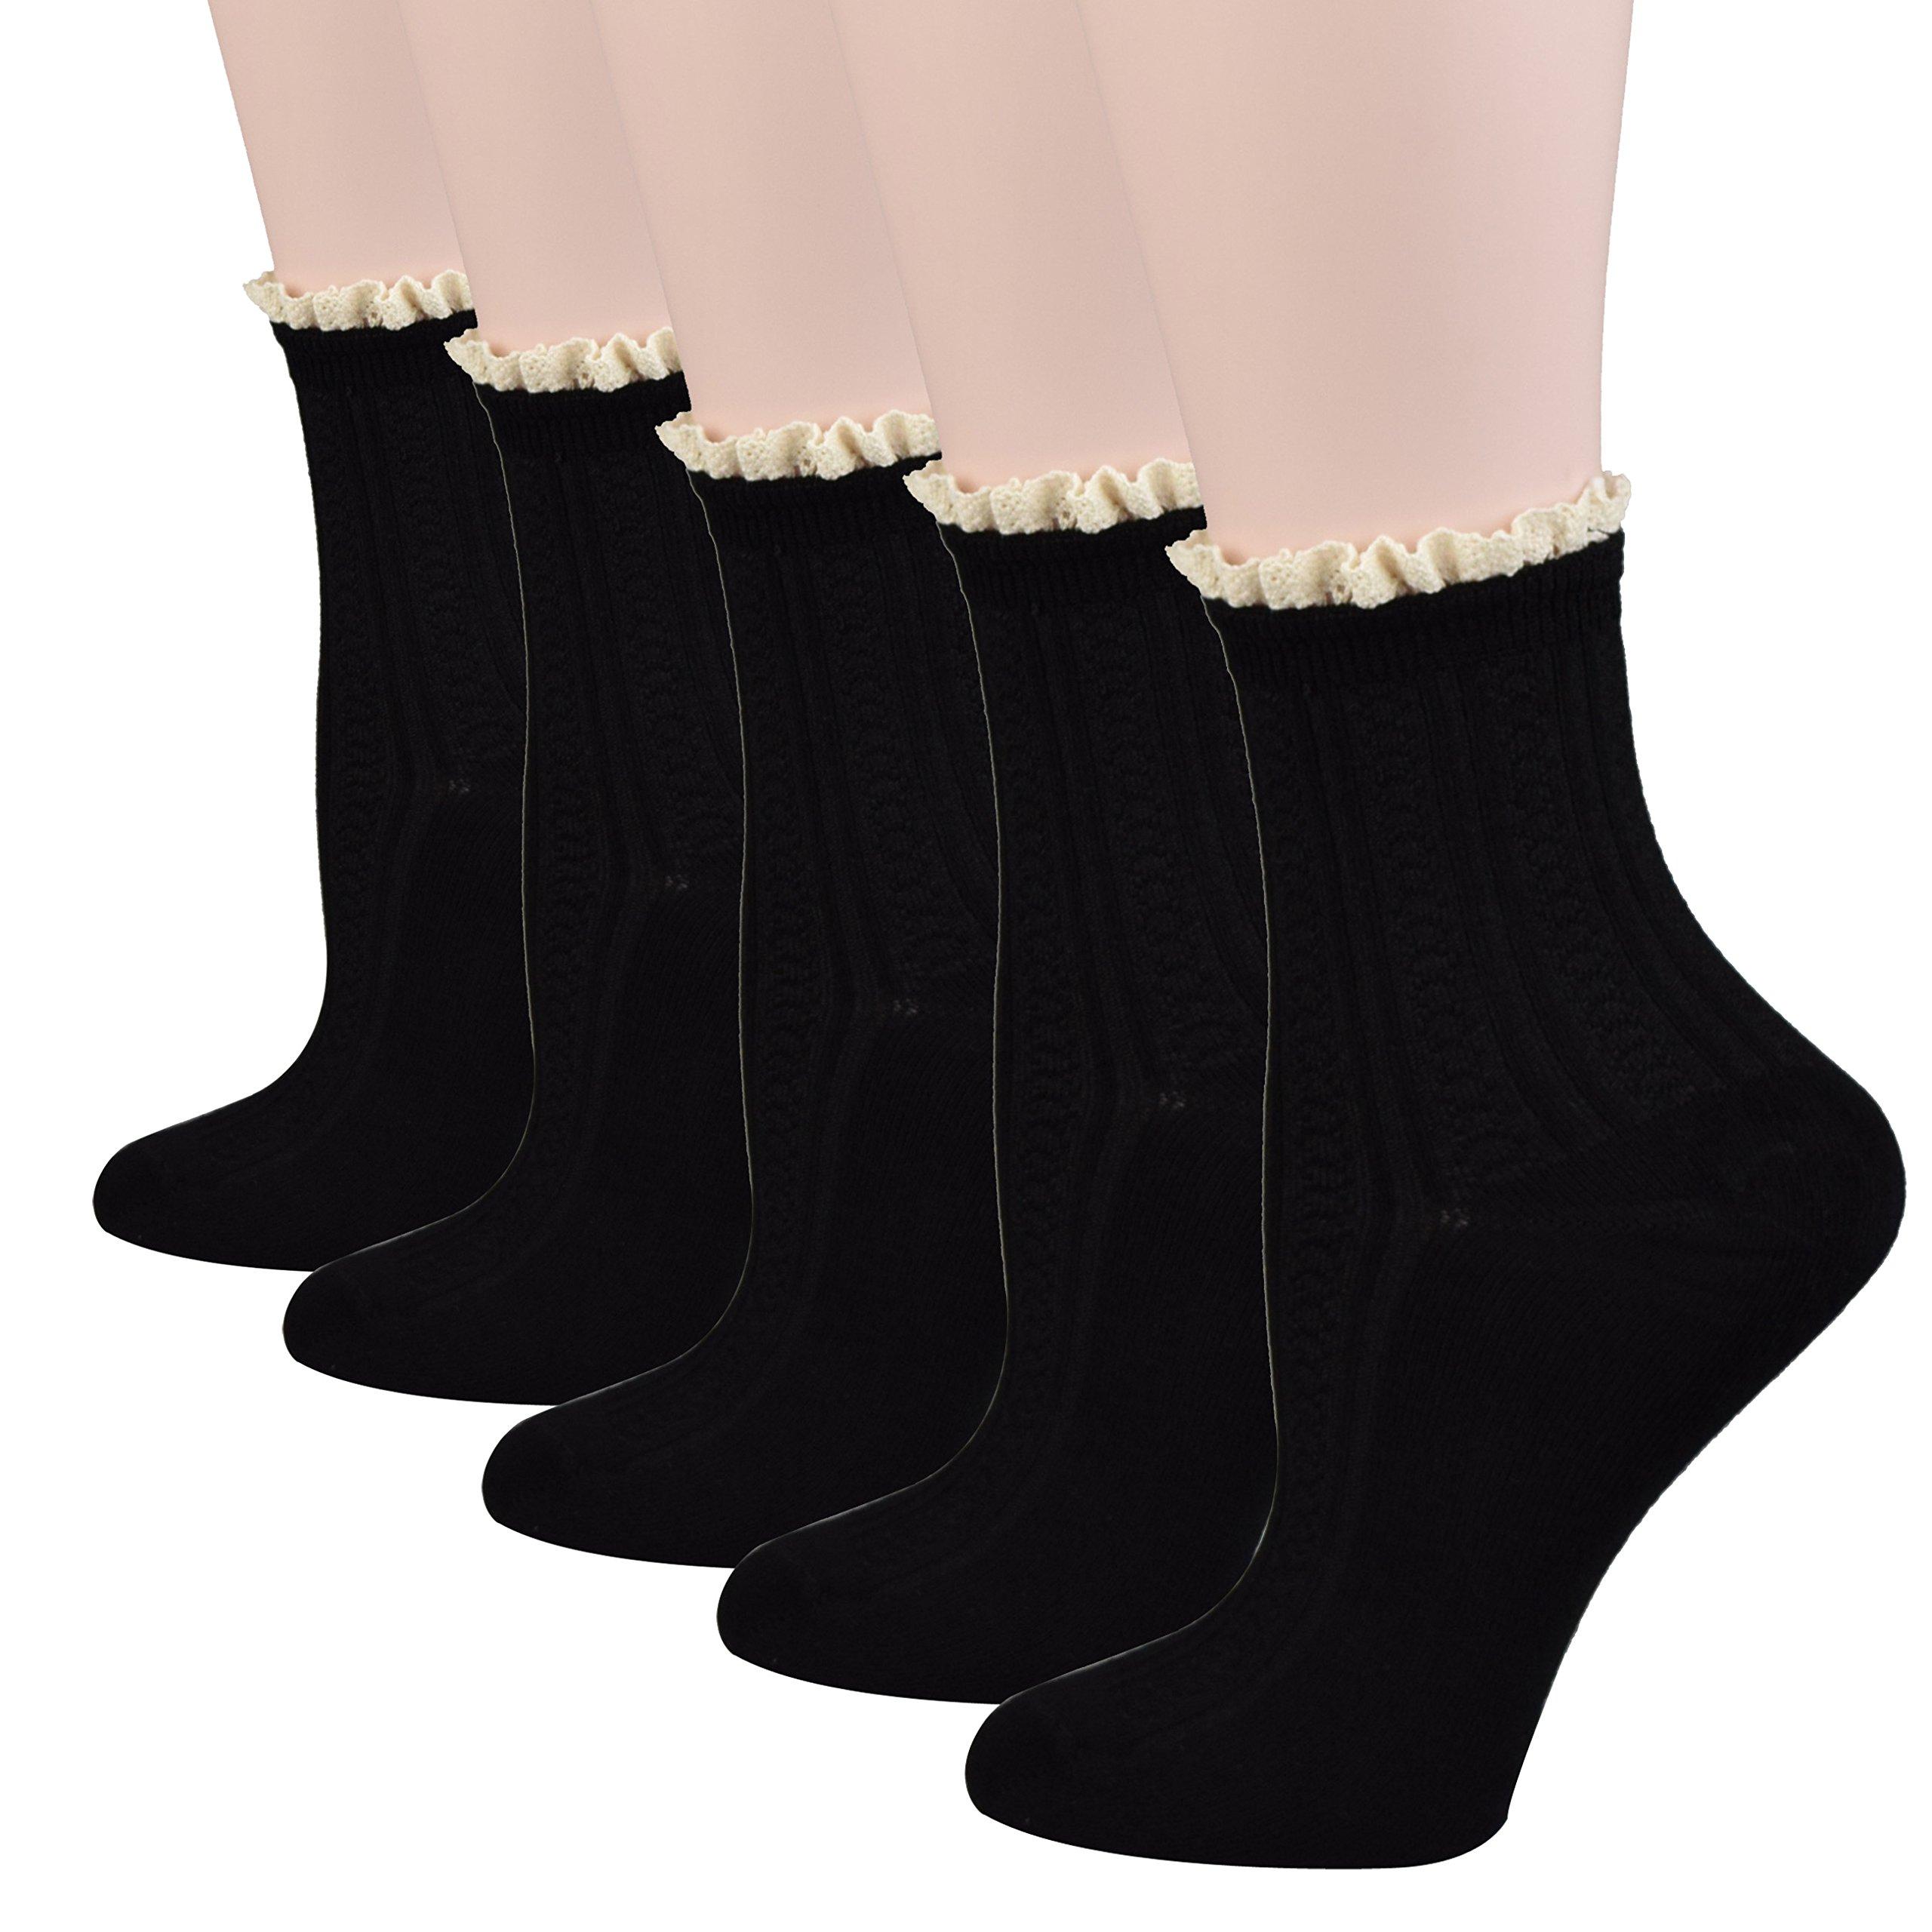 Fitu Women's Cute Rayon From Bamboo Crew Socks 5 Pairs Pack (Black)